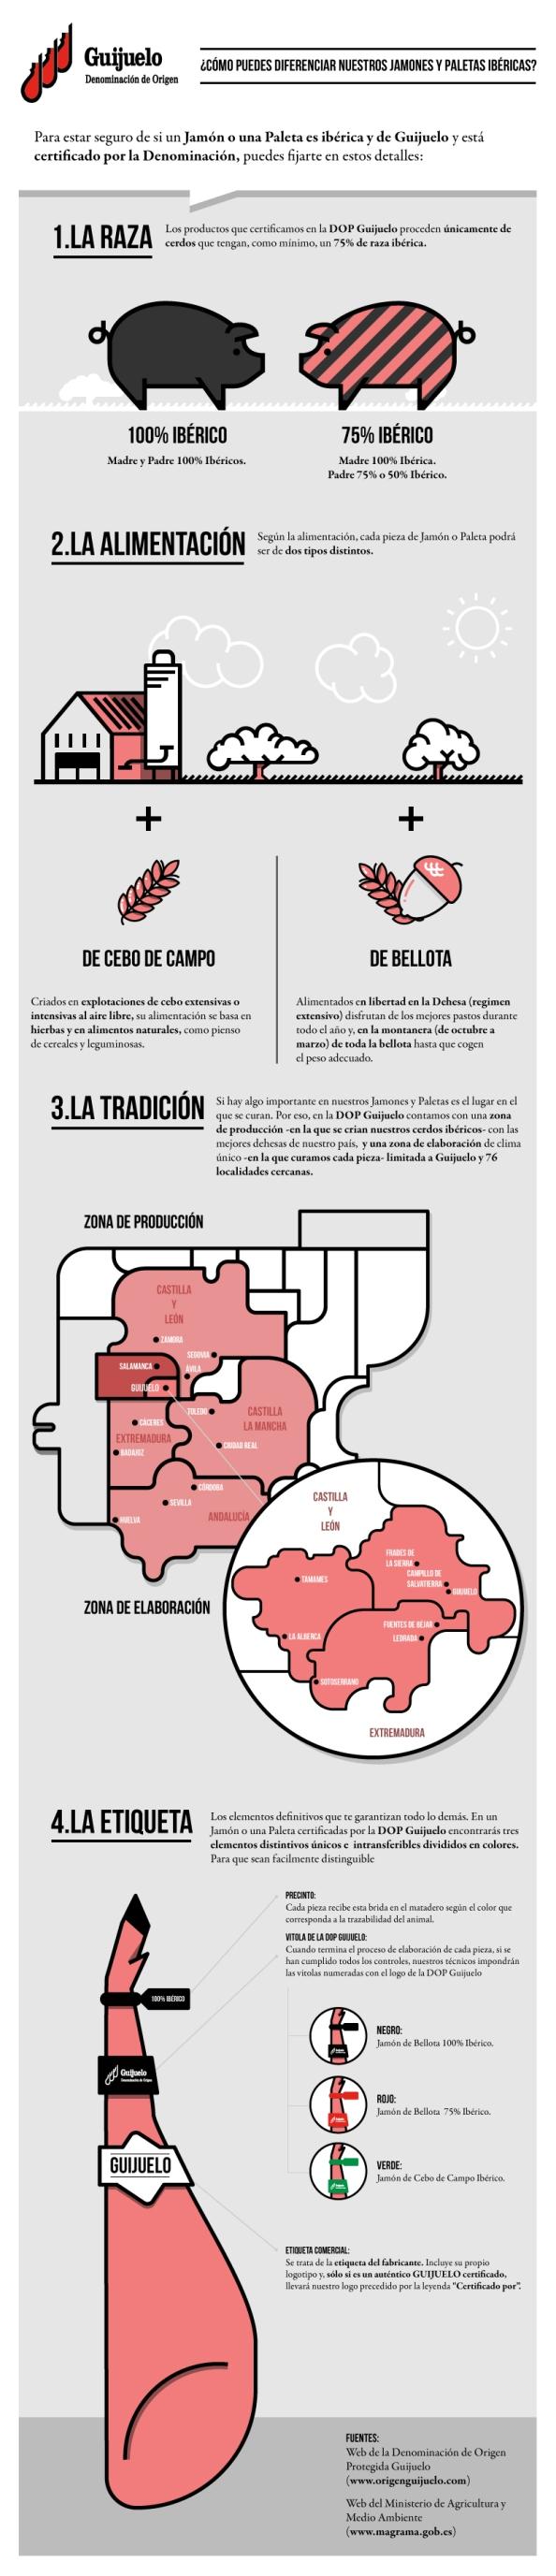 guijuelo-infografia-jamon-v14